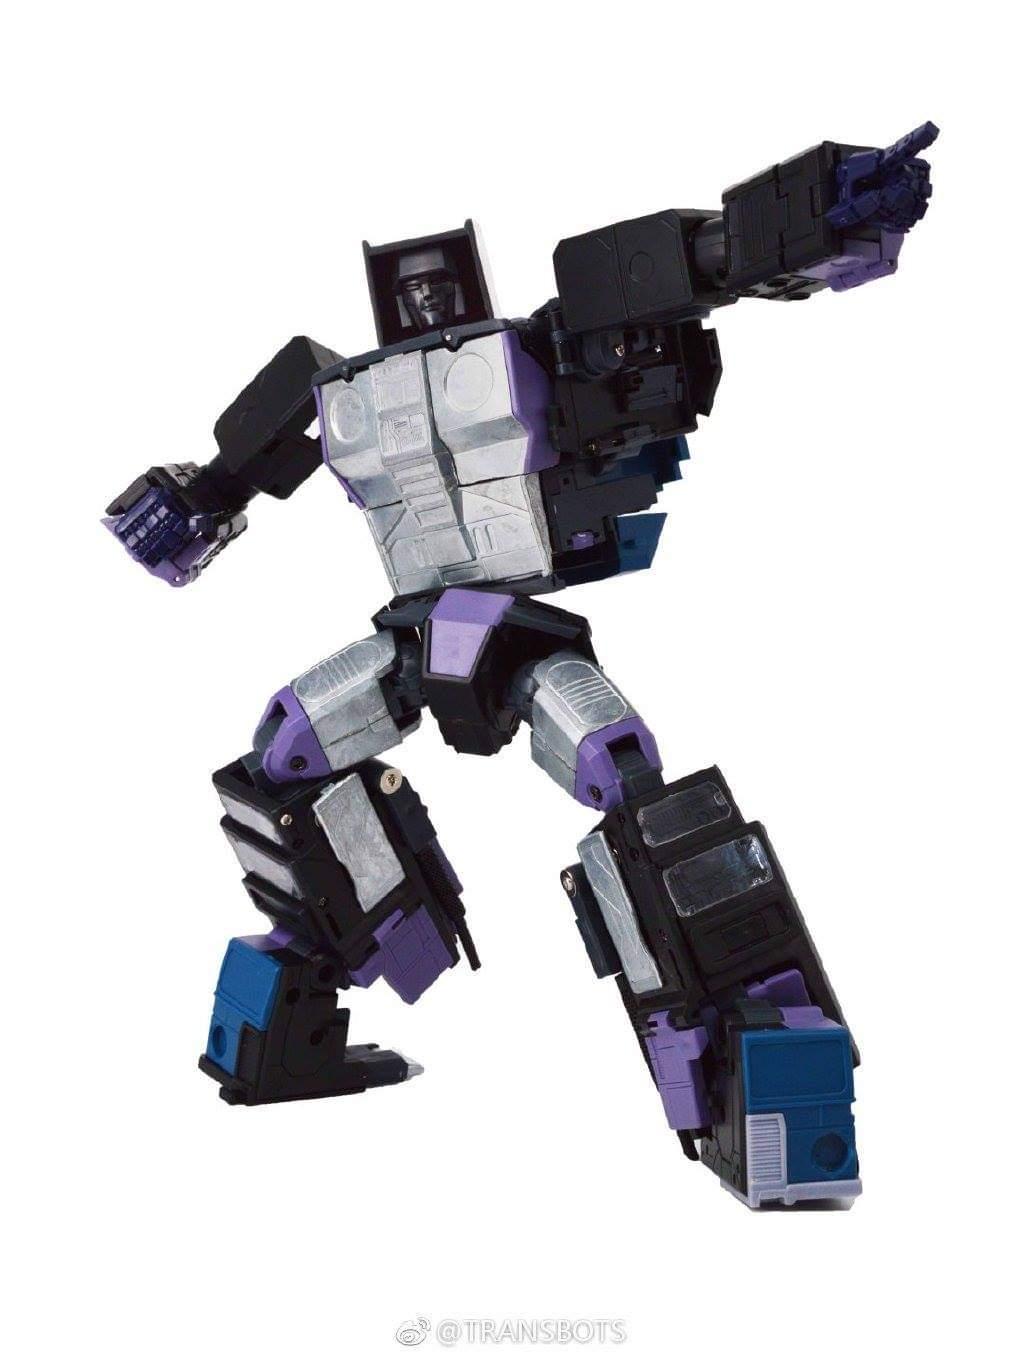 [X-Transbots] Produit Tiers - Jouets Berserkars forme Monolith (MX-XIII à MX-VII) - aka Stunticons forme Menasor/Menaseur - Page 5 IUdzzcTW_o